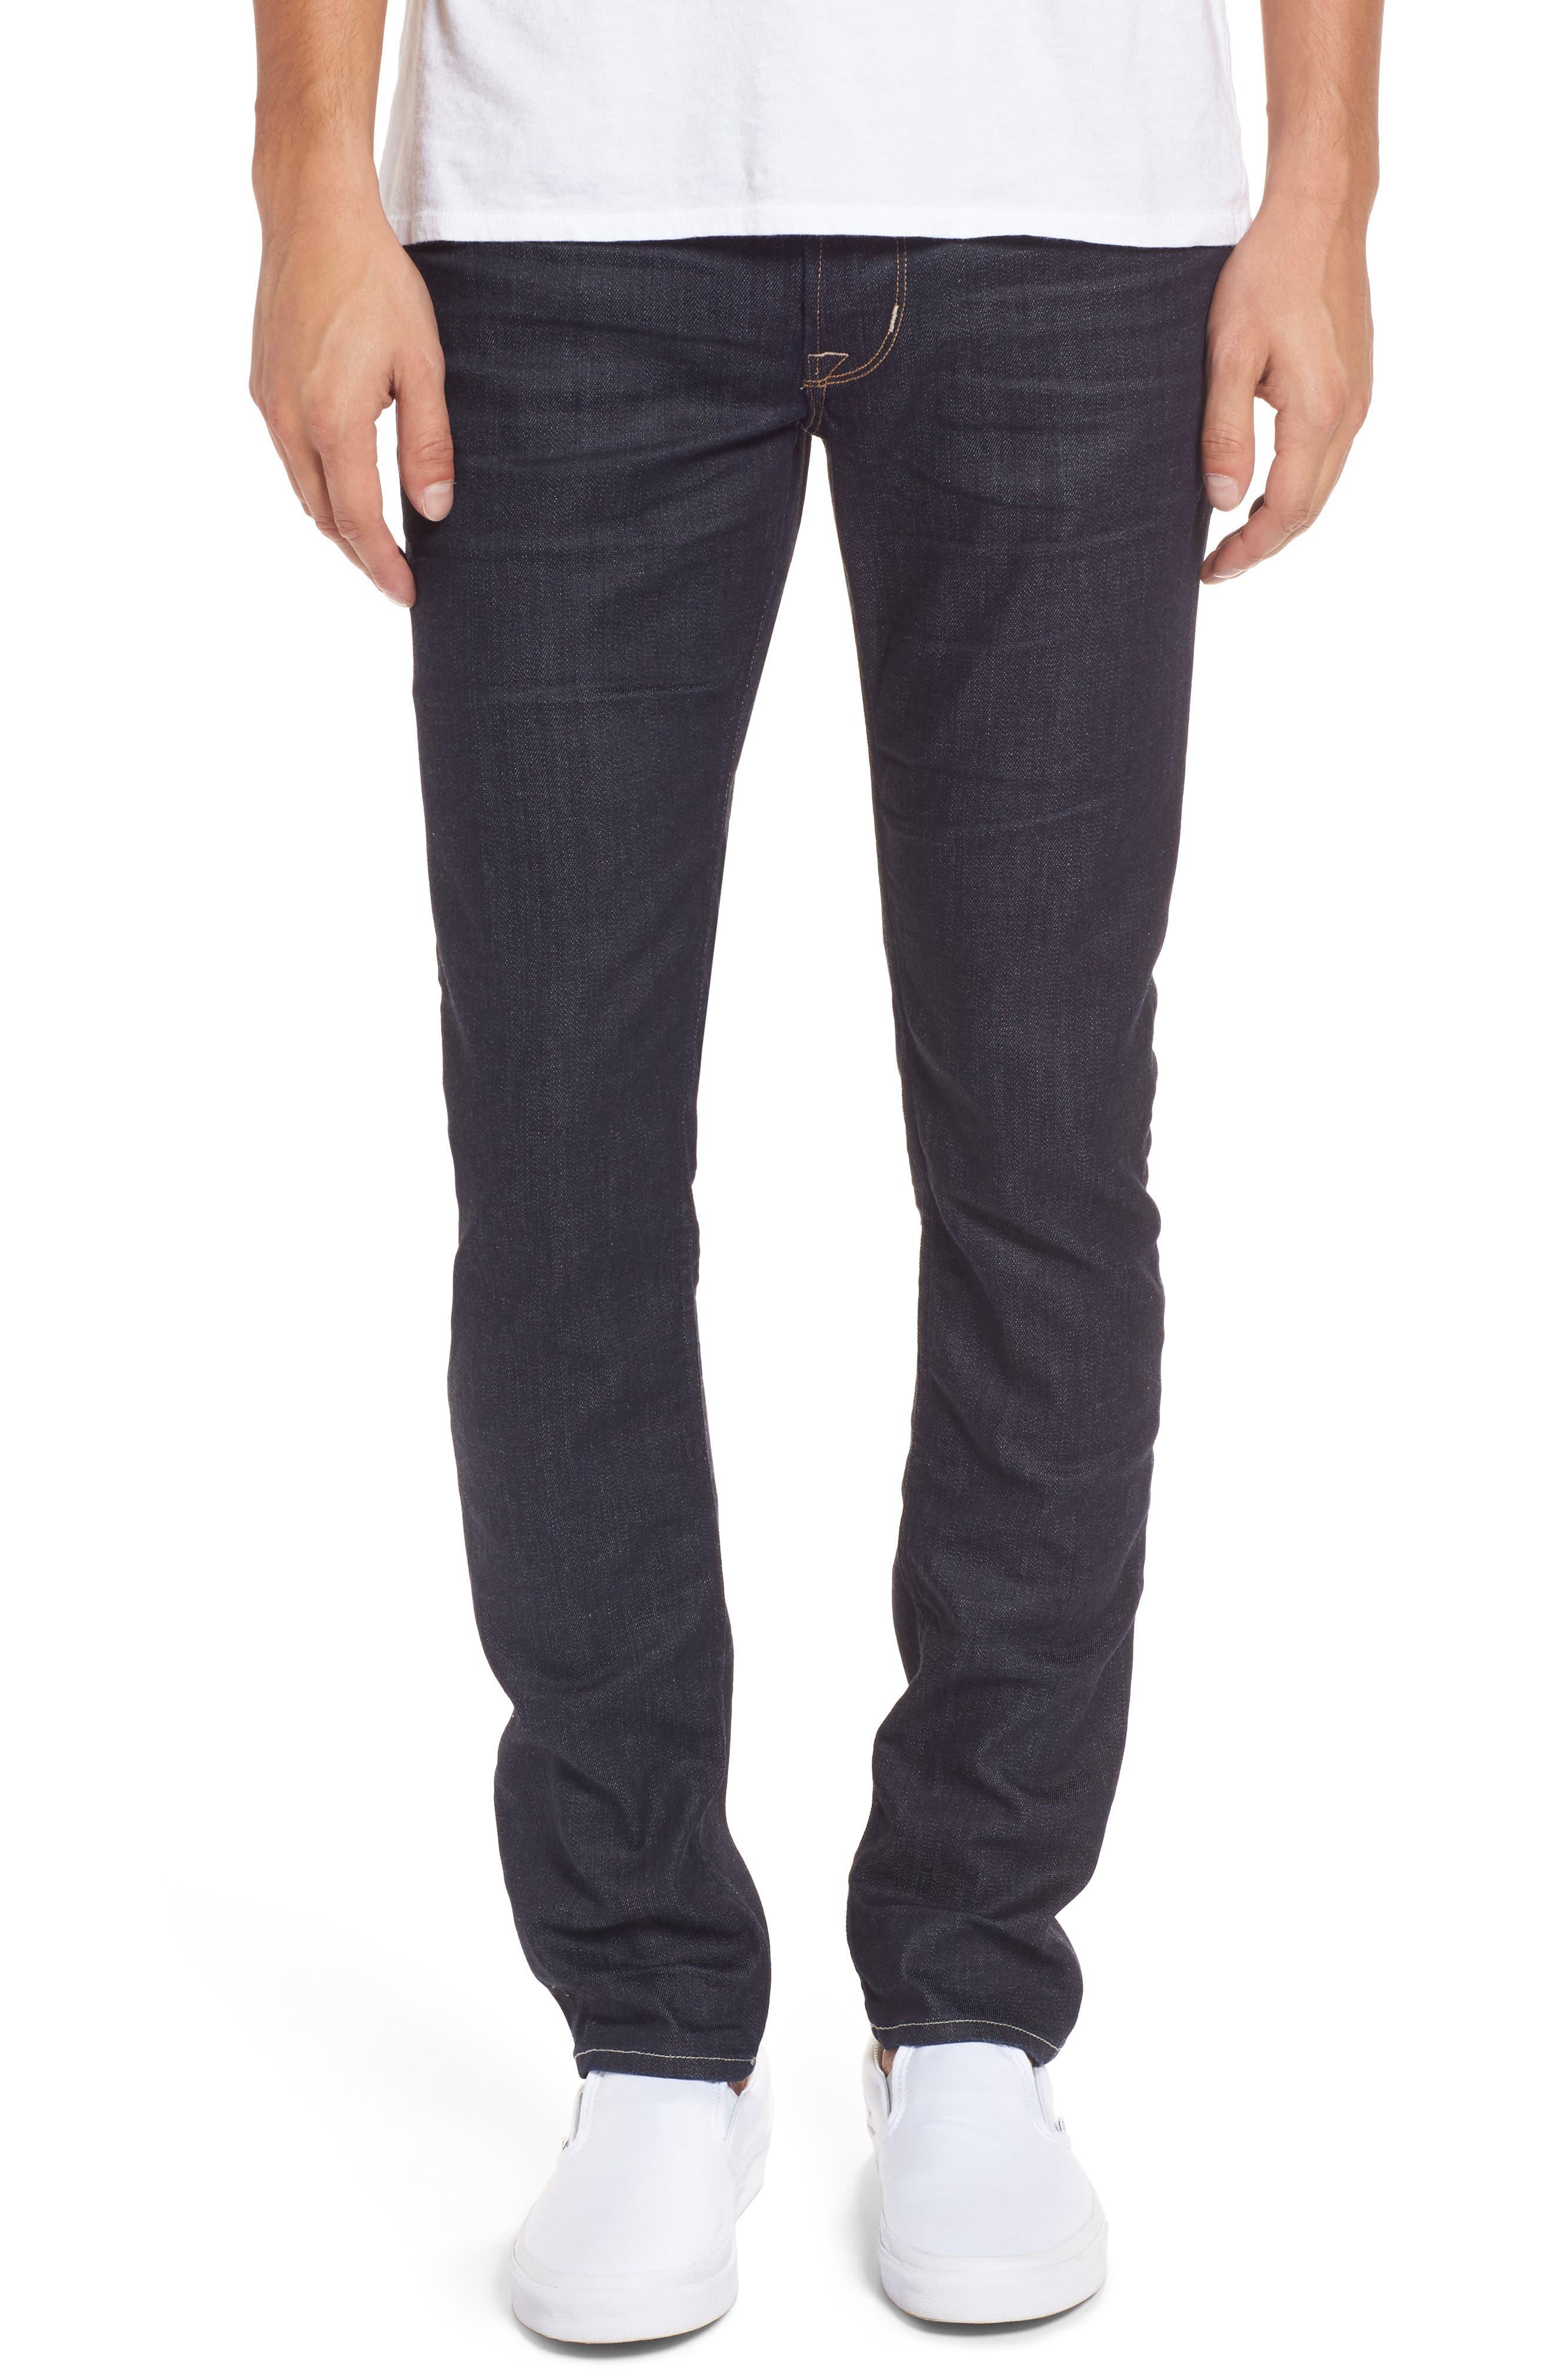 Hudson Axl Skinny Fit Jeans,                         Main,                         color, Fiend